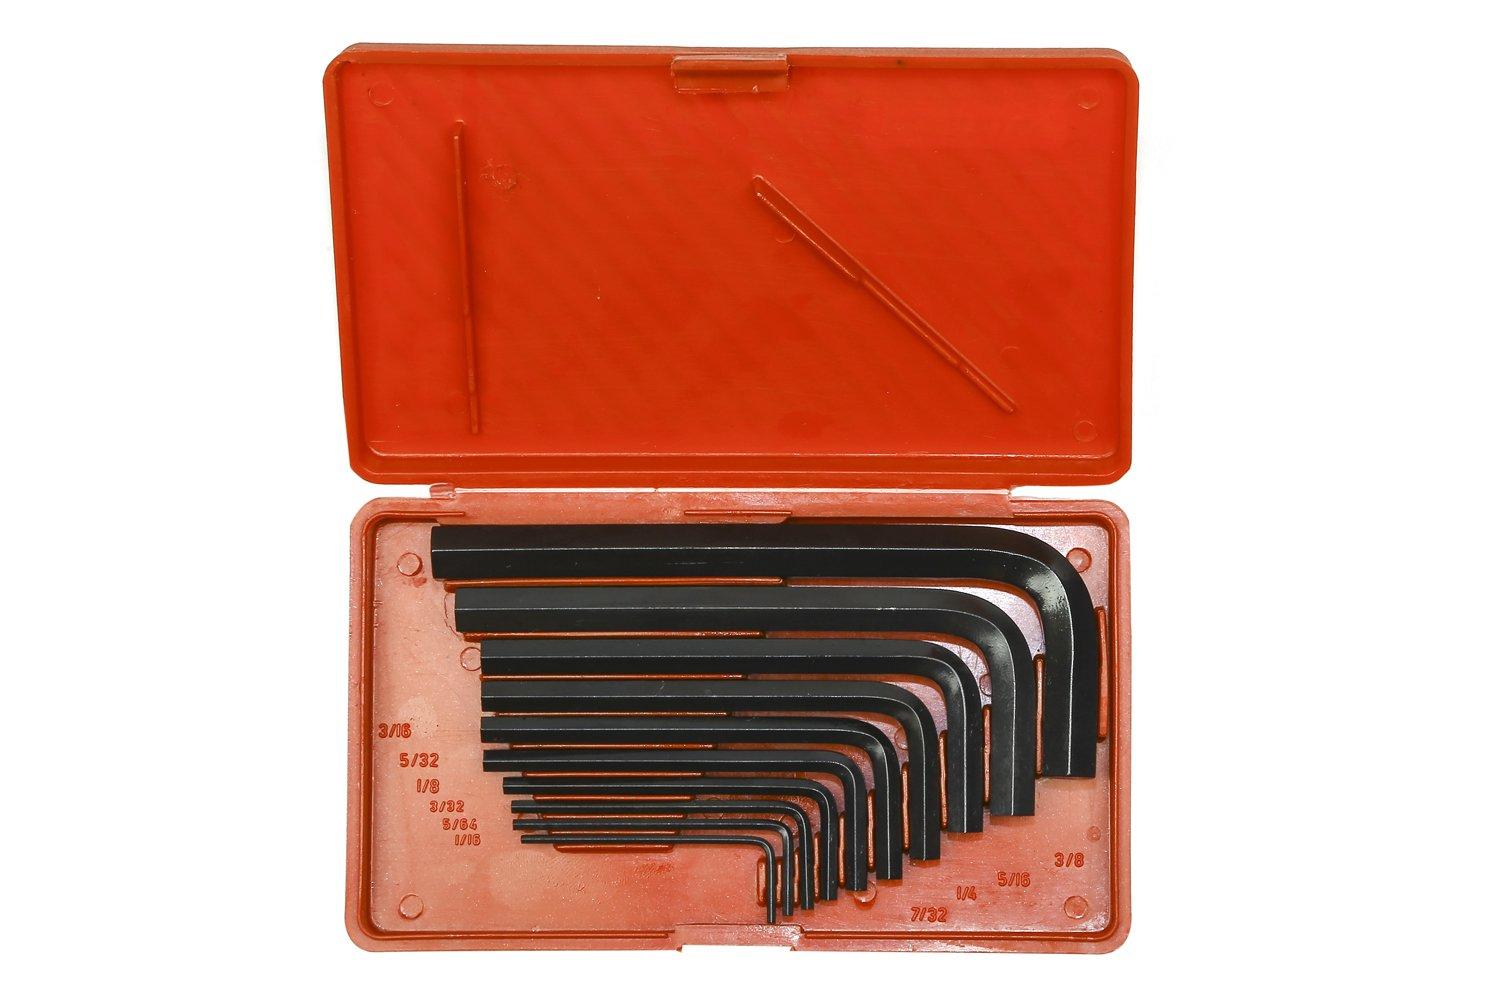 Taparia KI 10V Steel Allen Key Set (Black Finish, Box Packing, Pack of 10) product image